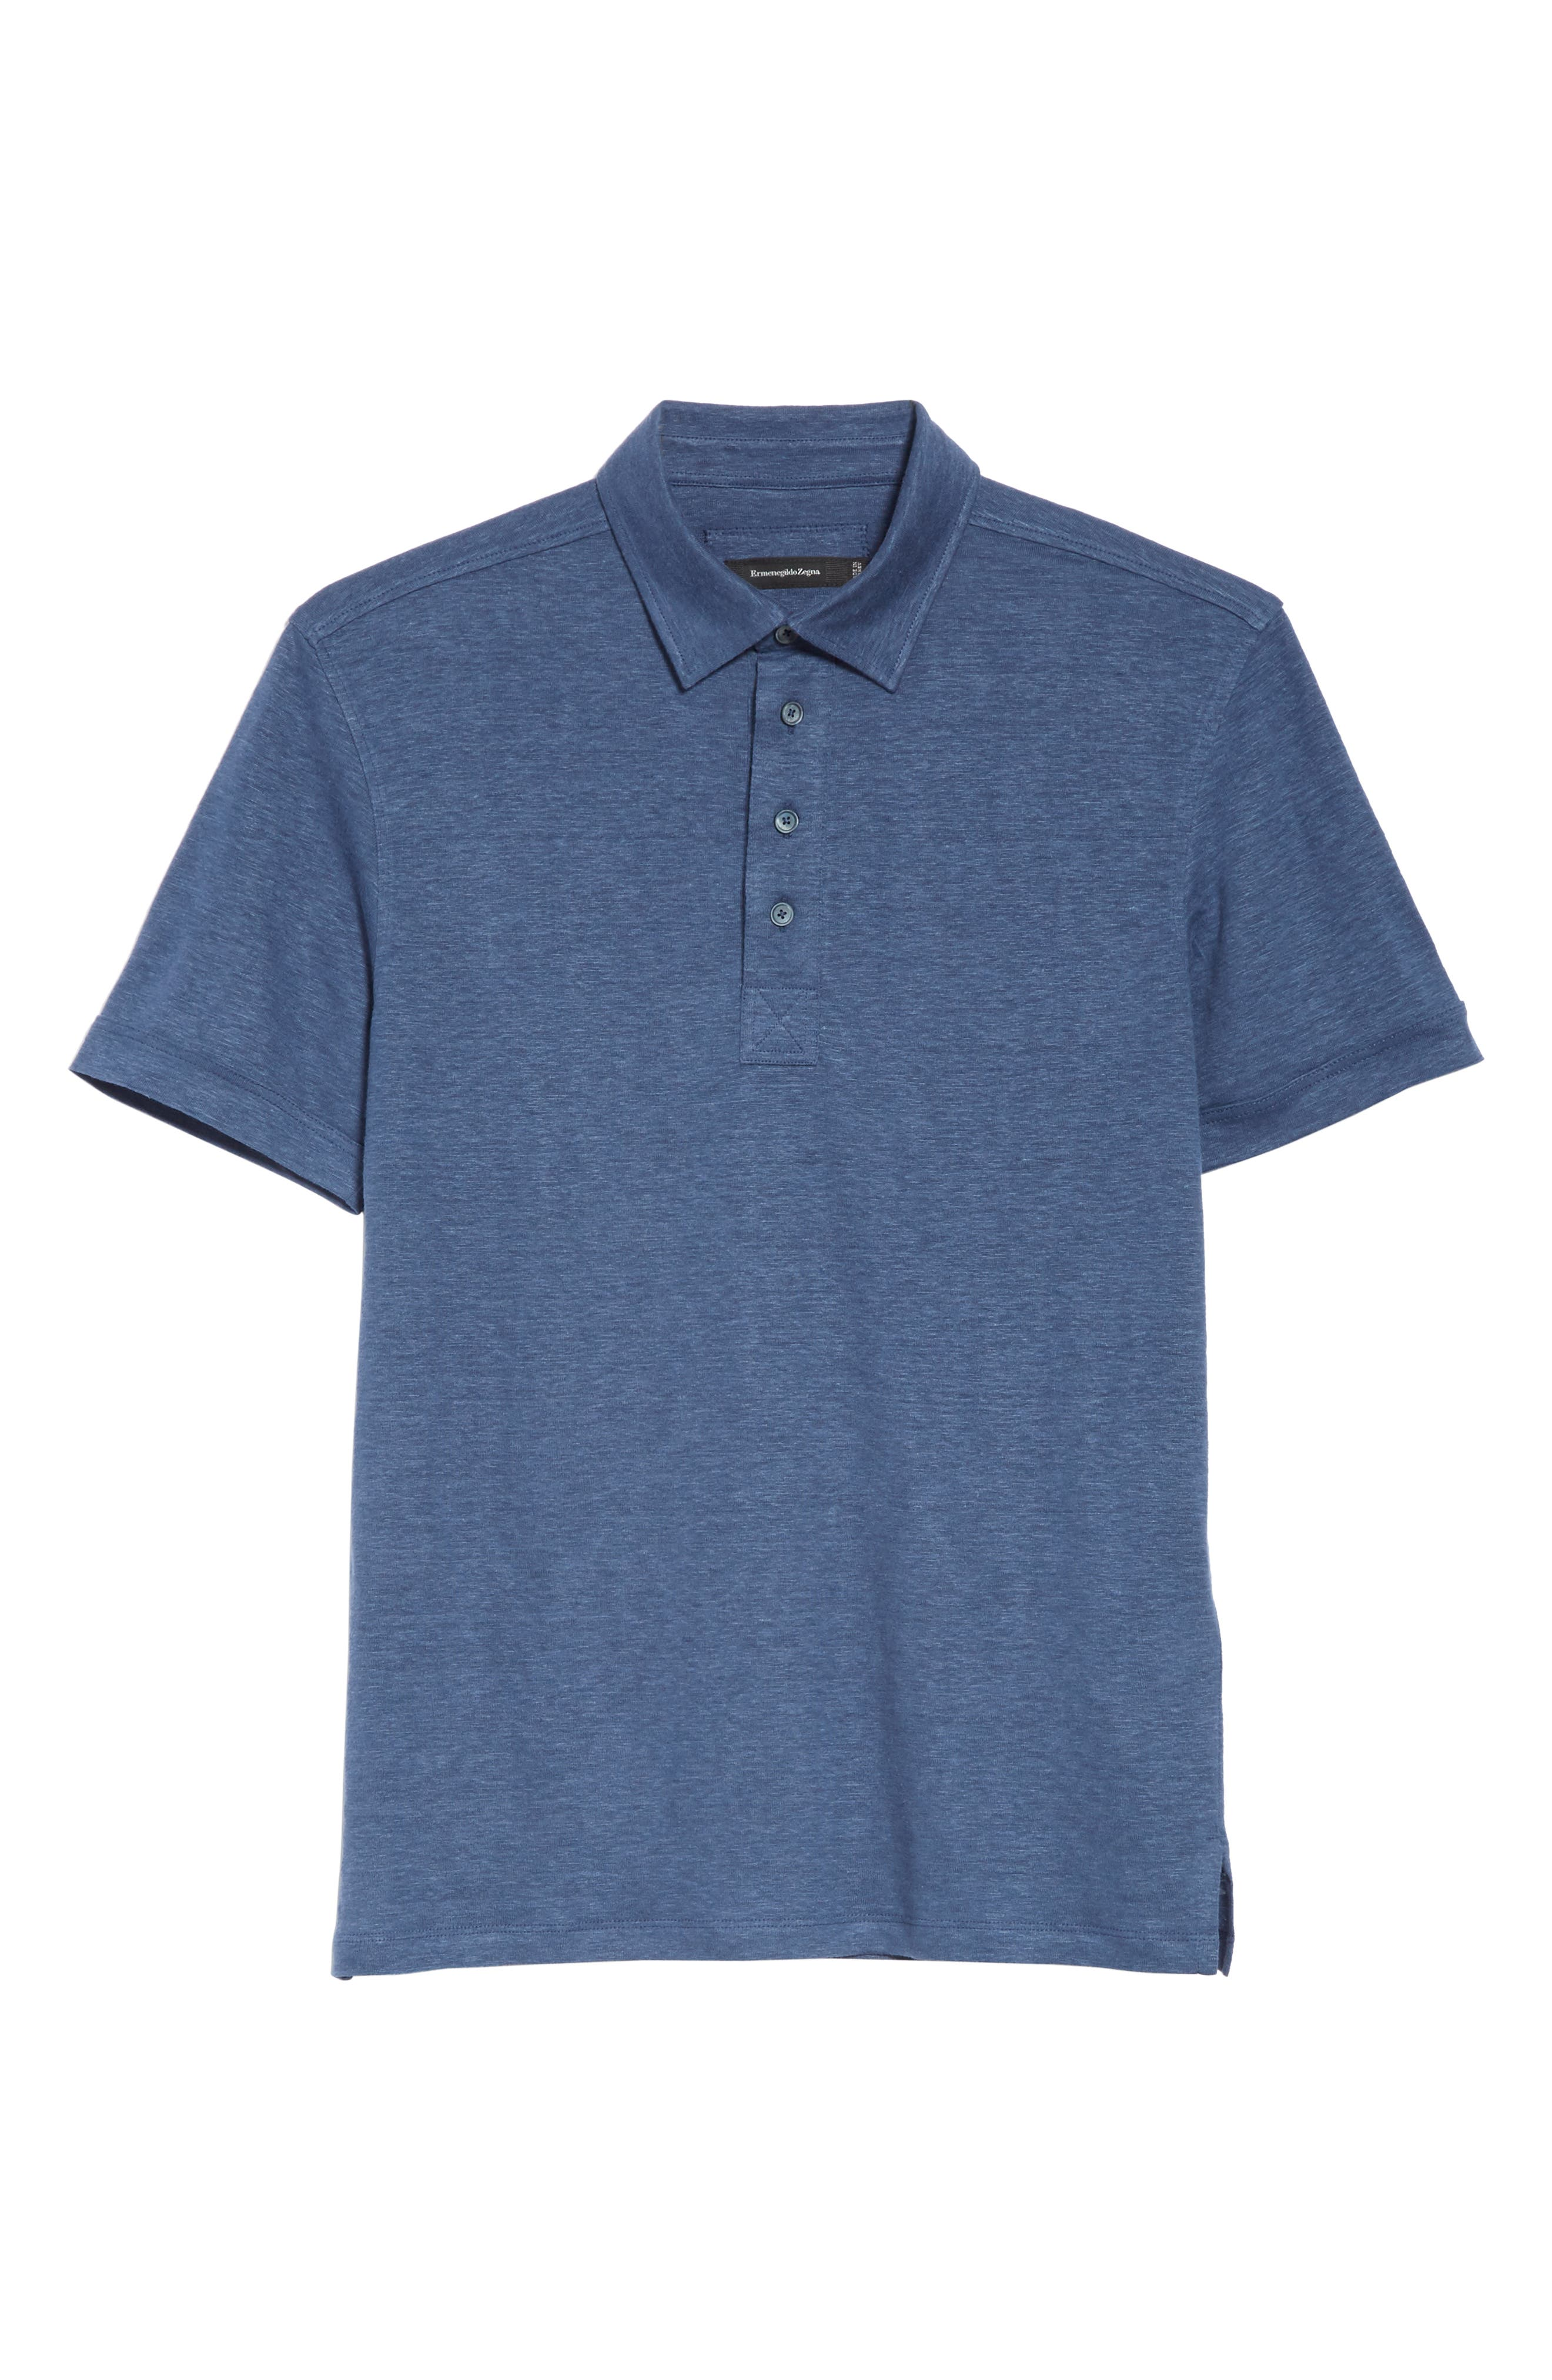 01d9aabce Men's Ermenegildo Zegna Polo Shirts | Nordstrom